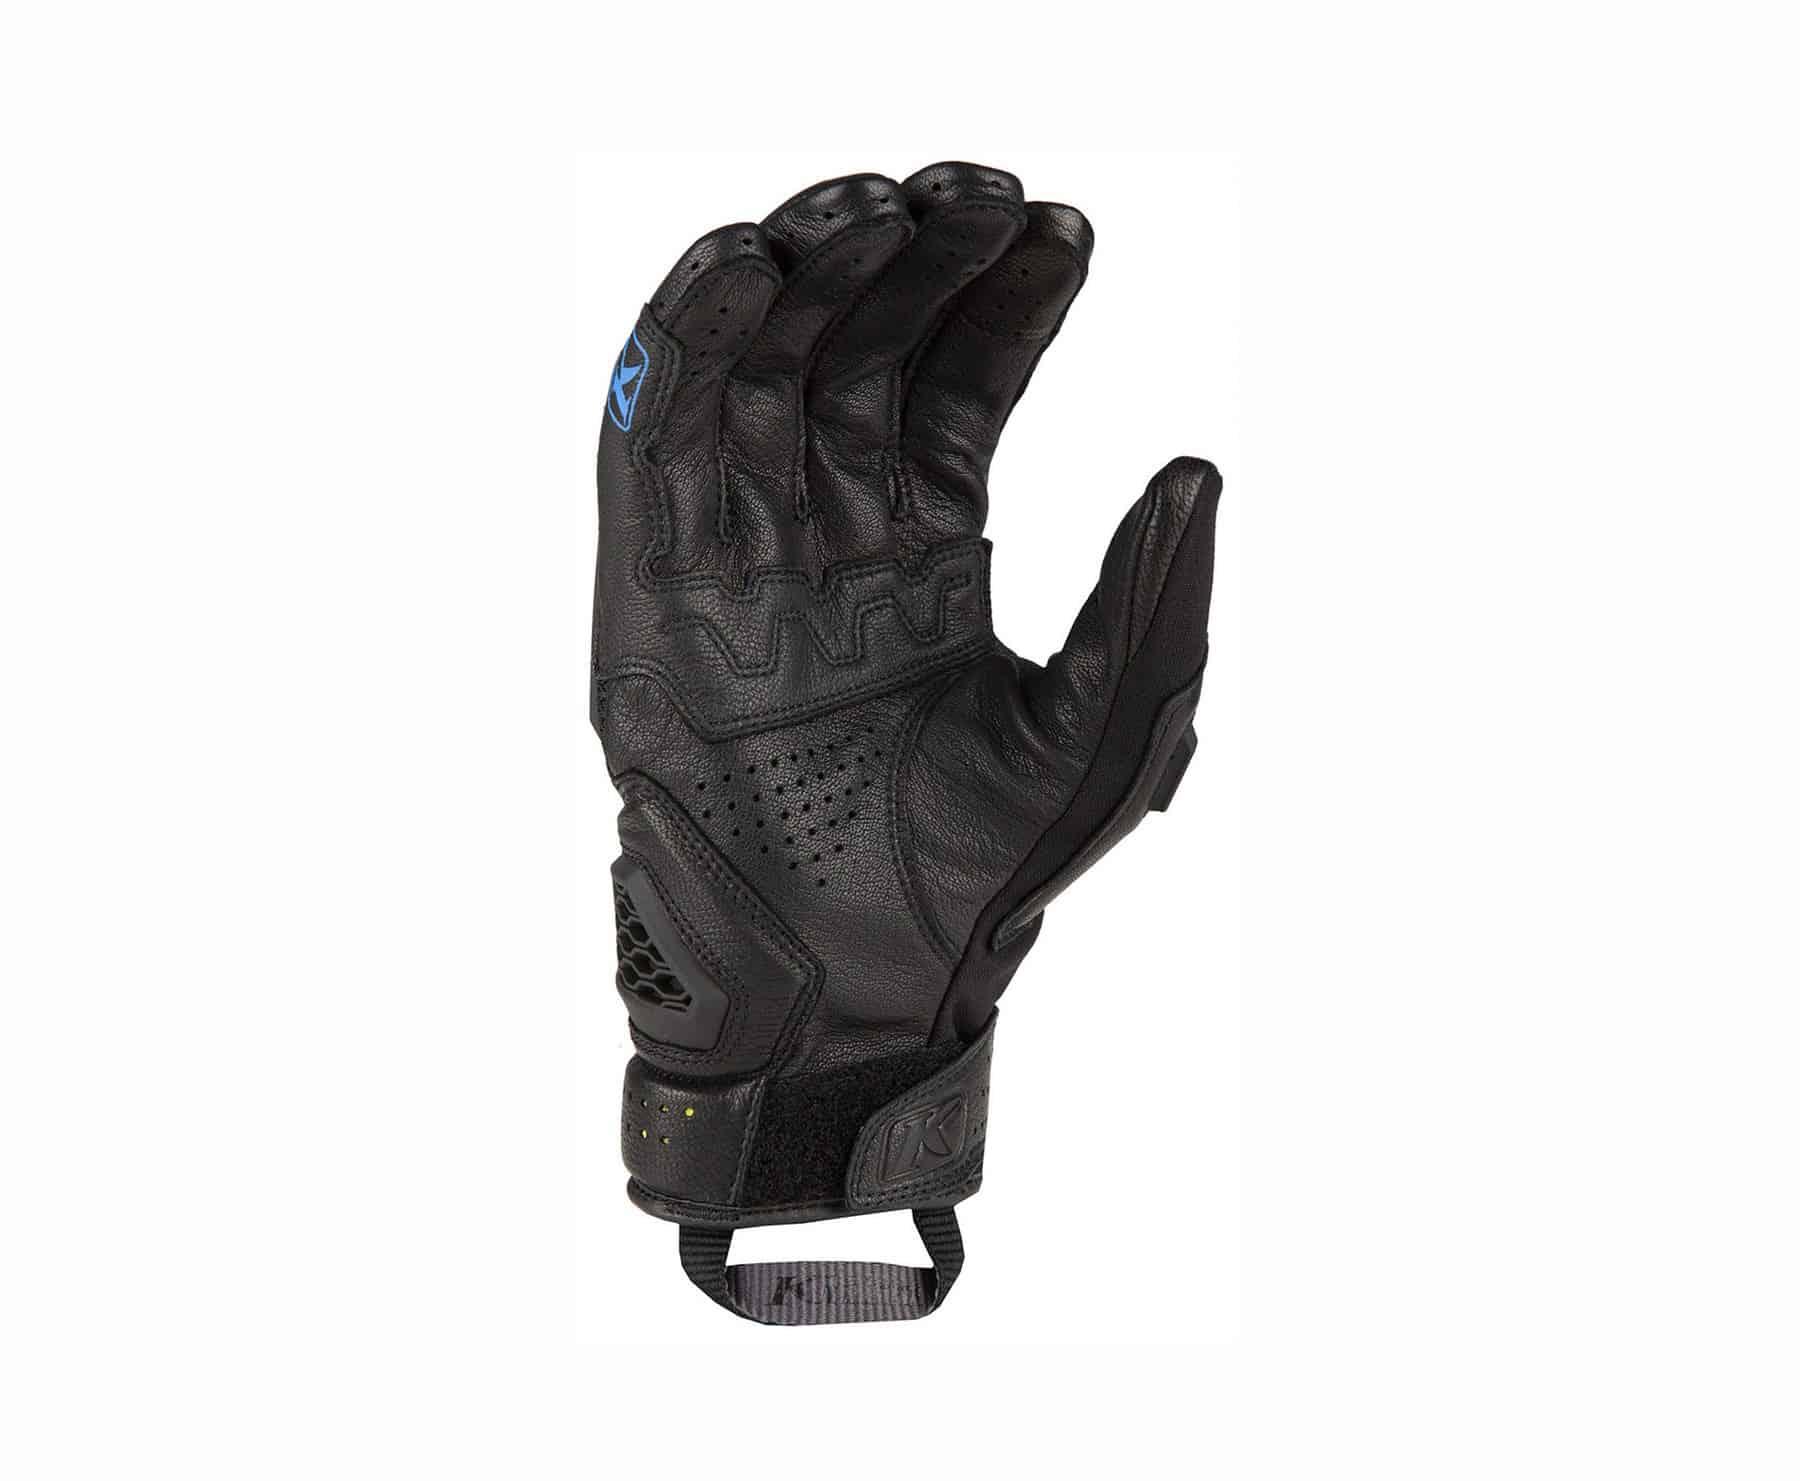 KLIM-New-Baja-S4-gloves 1b